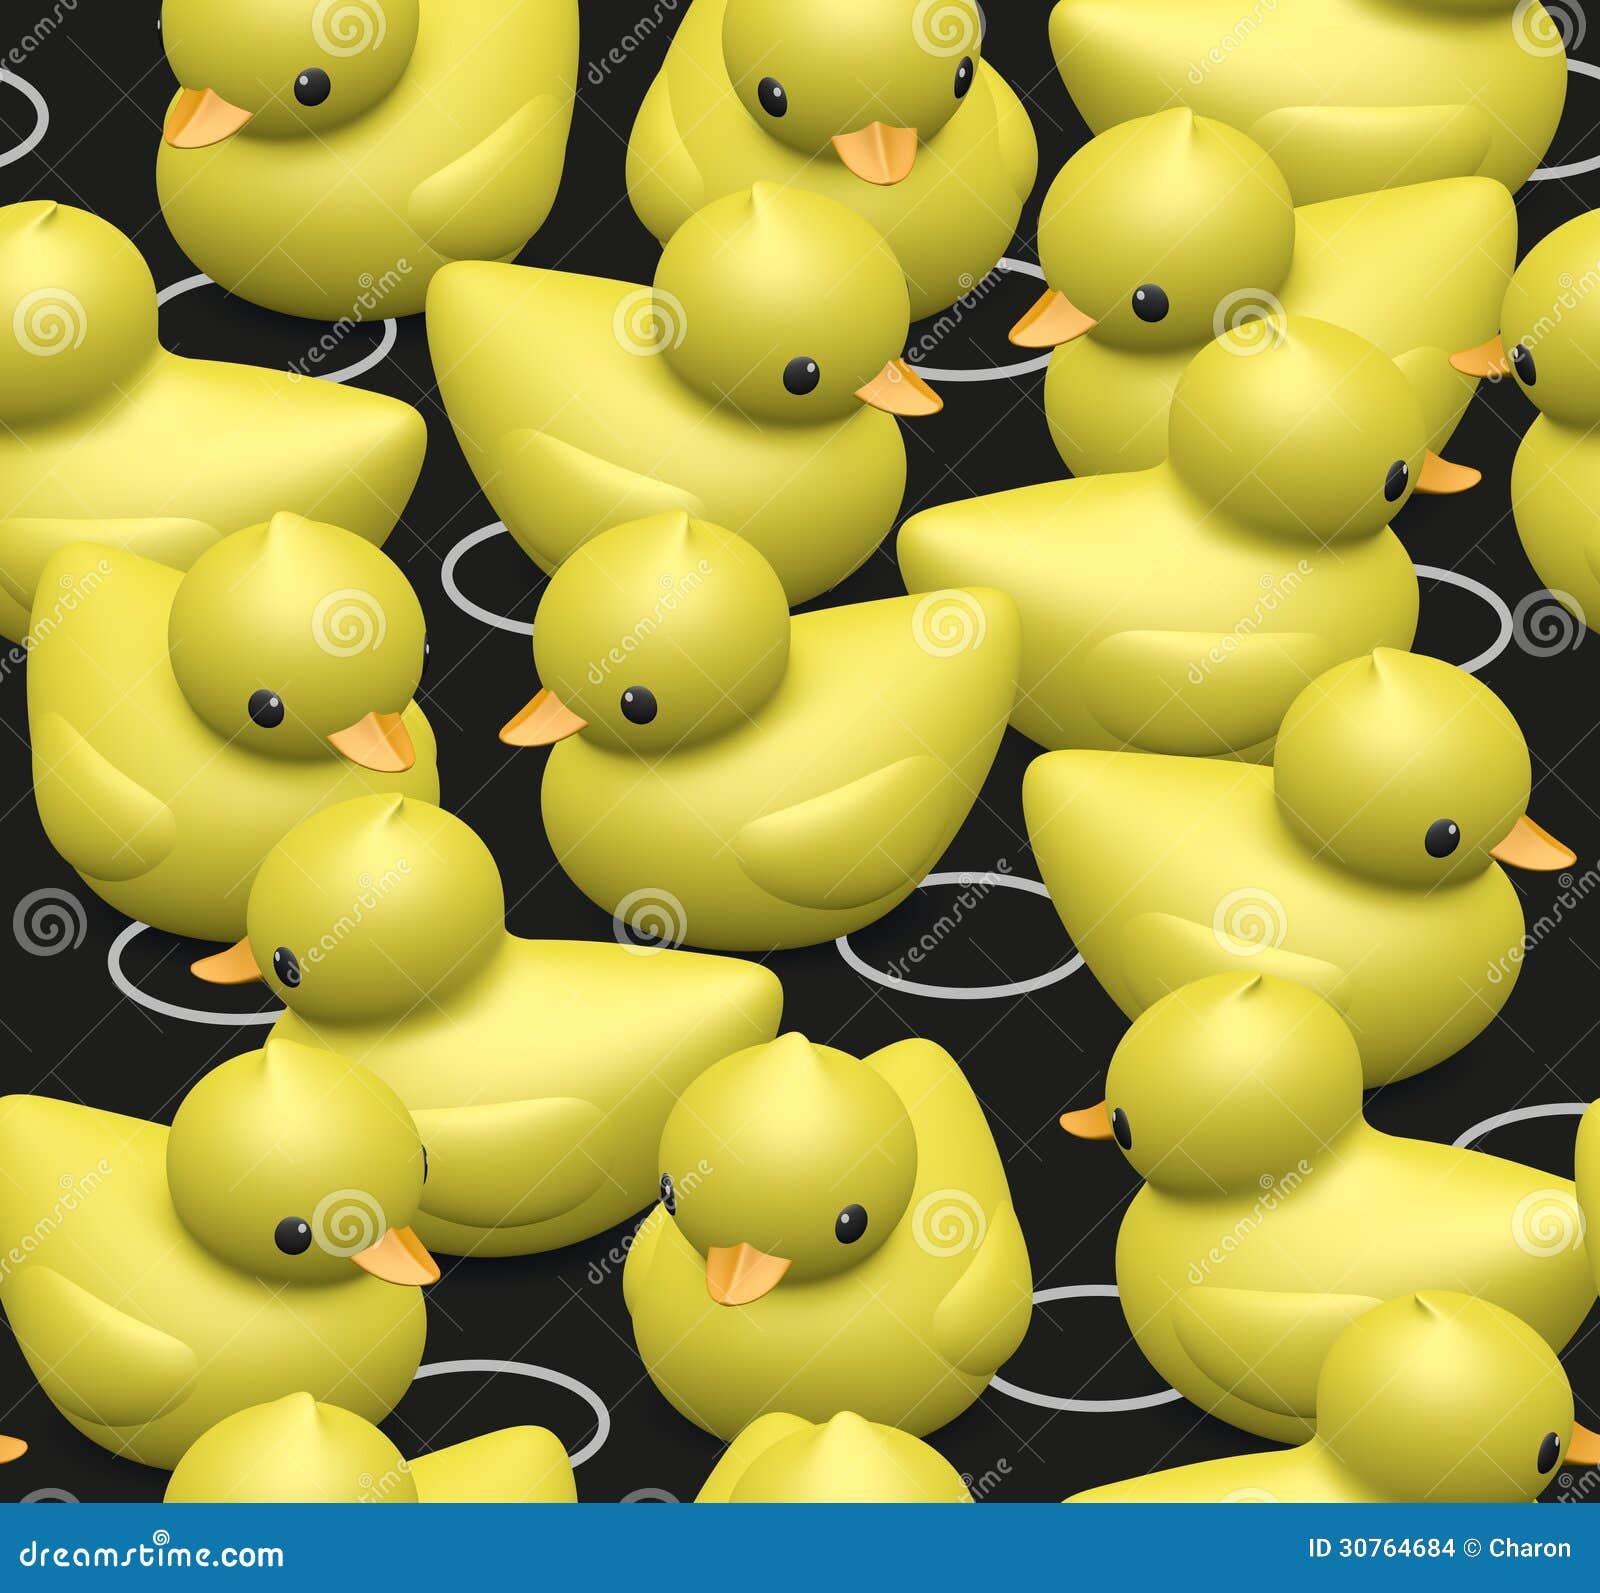 Rubber Duck Pattern Seamless Texture Kids Stock Photo